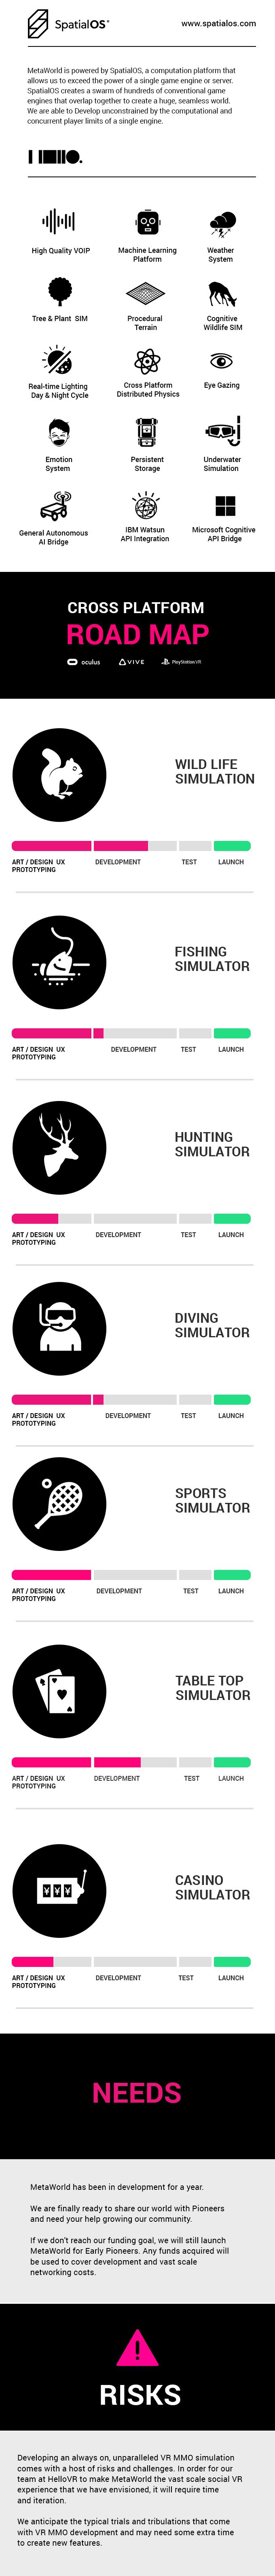 MetaWorld - The VR MMO simulation | Indiegogo